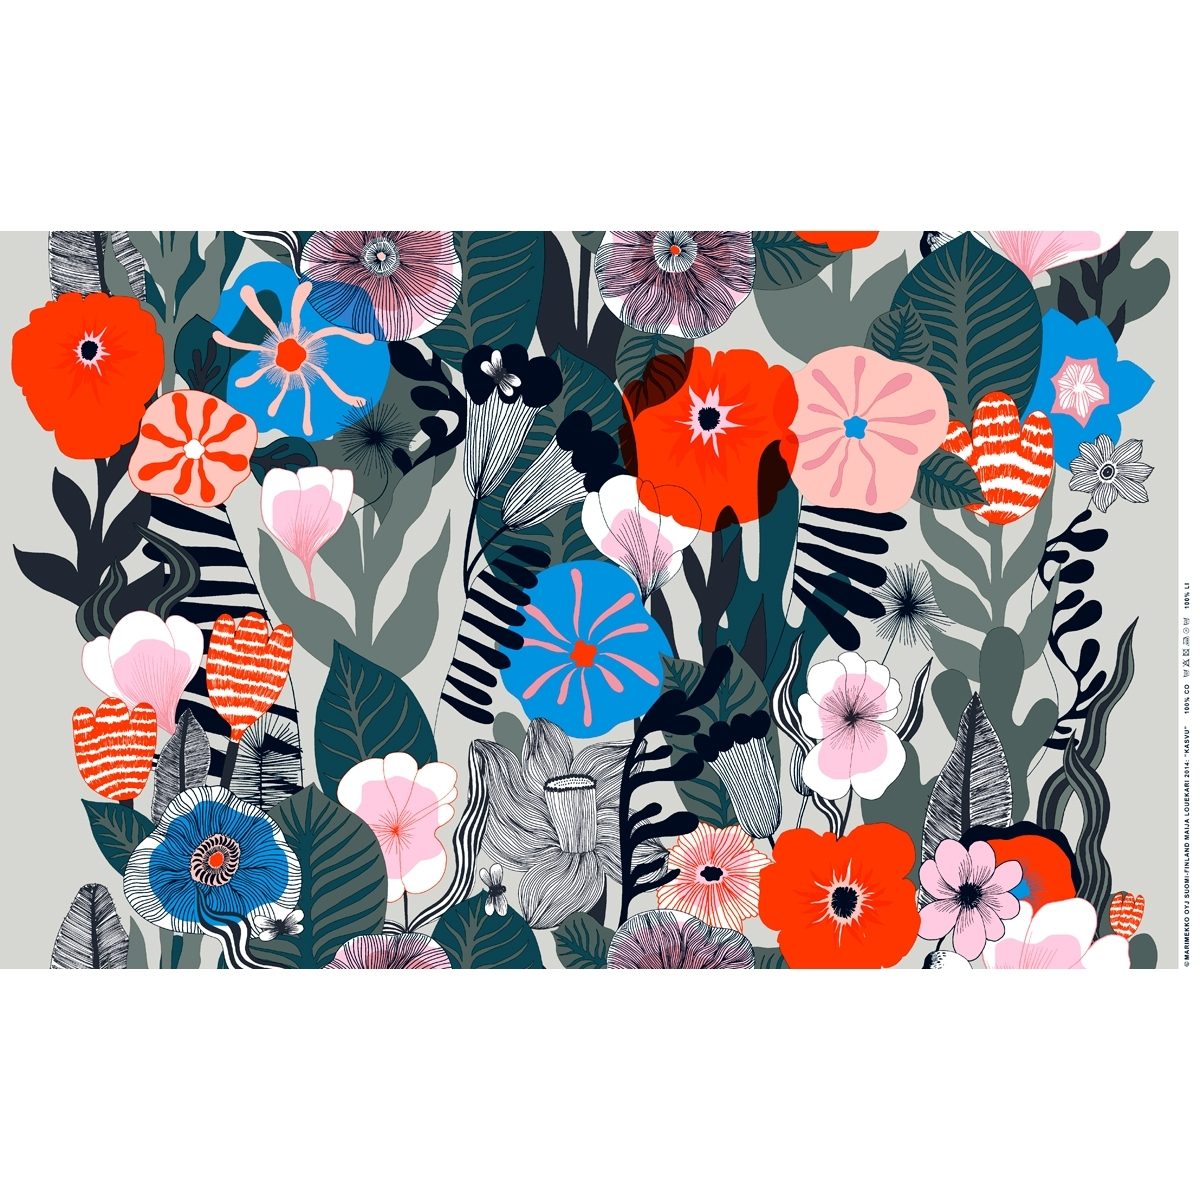 Marimekko Kasvu Grey Pvc Fabric 35 1,200×1,200 Pixels | Home Throughout Recent Marimekko 'kevatjuhla' Fabric Wall Art (Gallery 13 of 15)